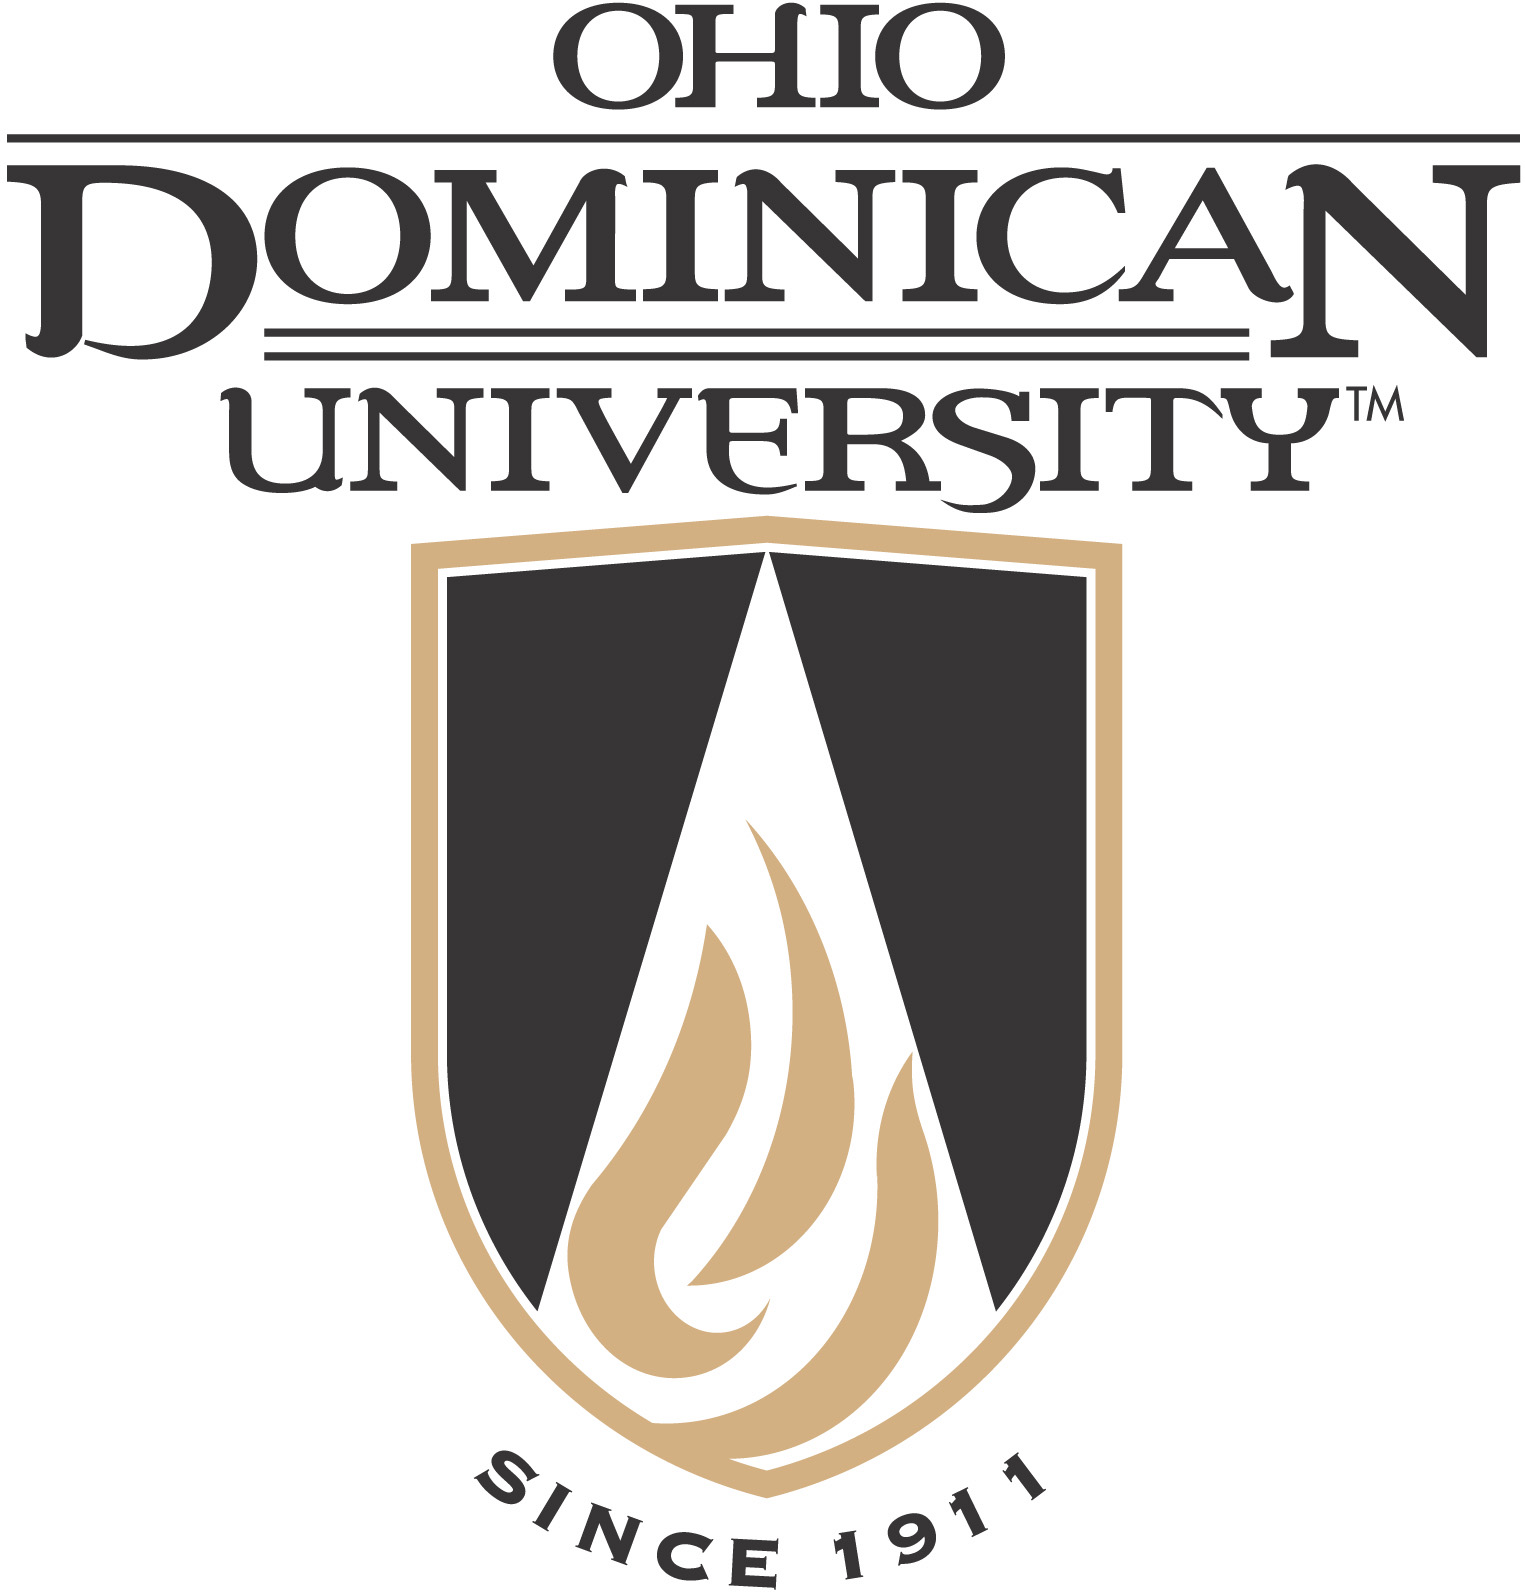 OHIO DOMINICAN UNIVERSITY - USA